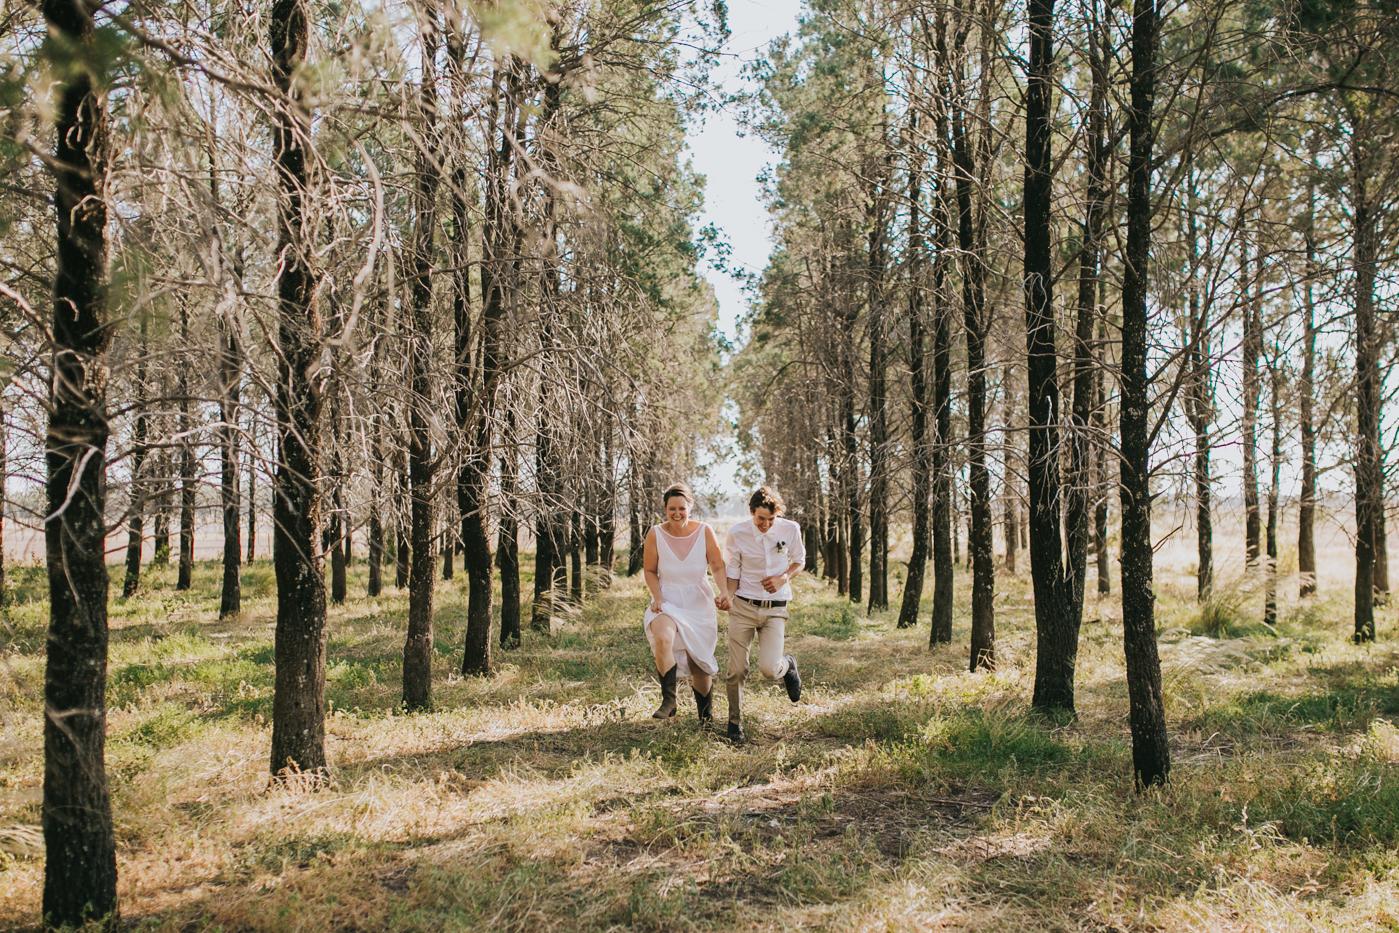 Nicolle & Jacob - Dubbo Wedding - Country Australia - Samantha Heather Photography-187.jpg